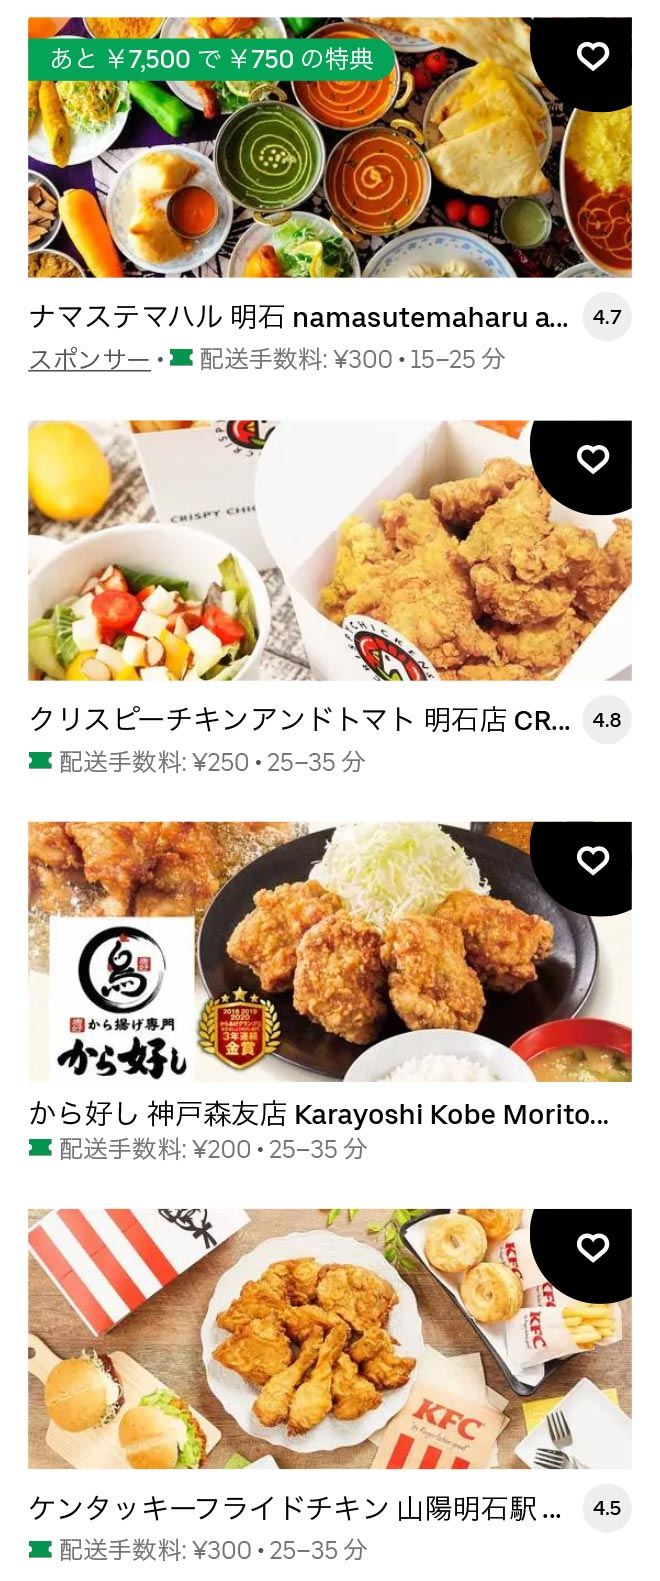 U nishi akashi 2103 01